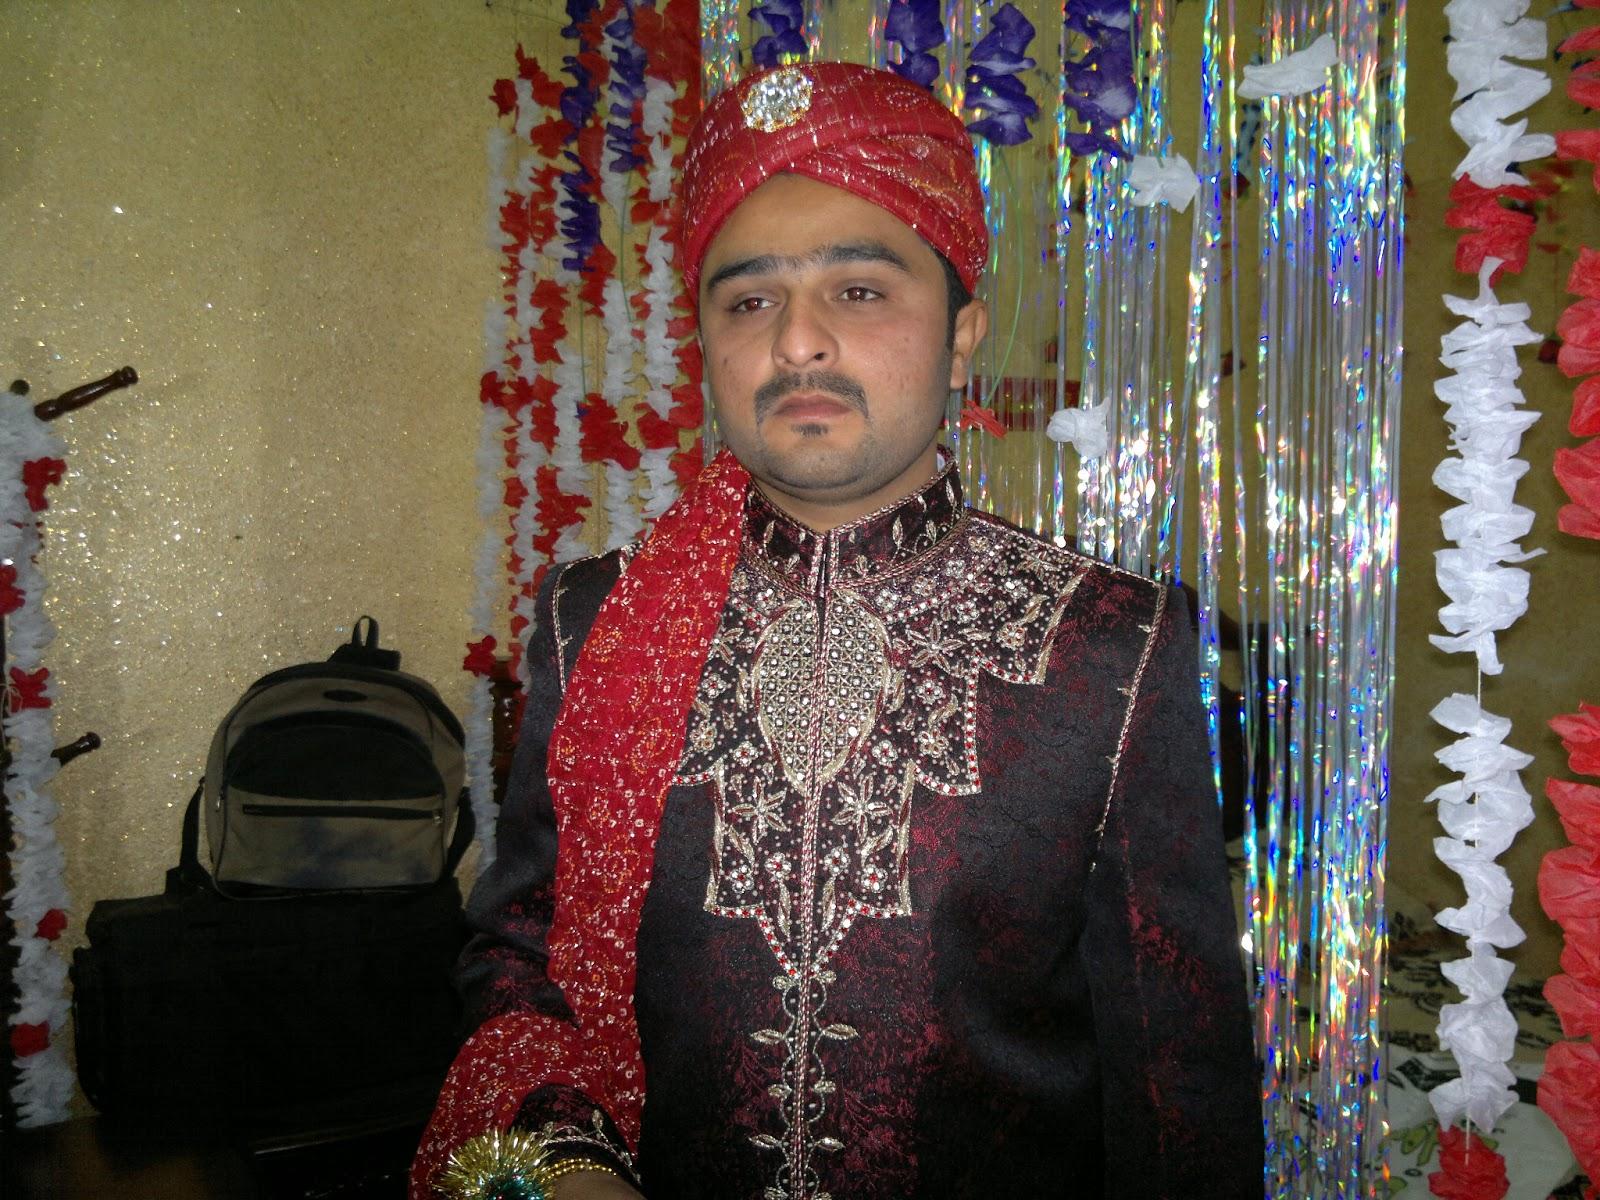 8dacabe55d Groom Dress design in Pakistan punjab-2013 punjab shaadi dresss ...